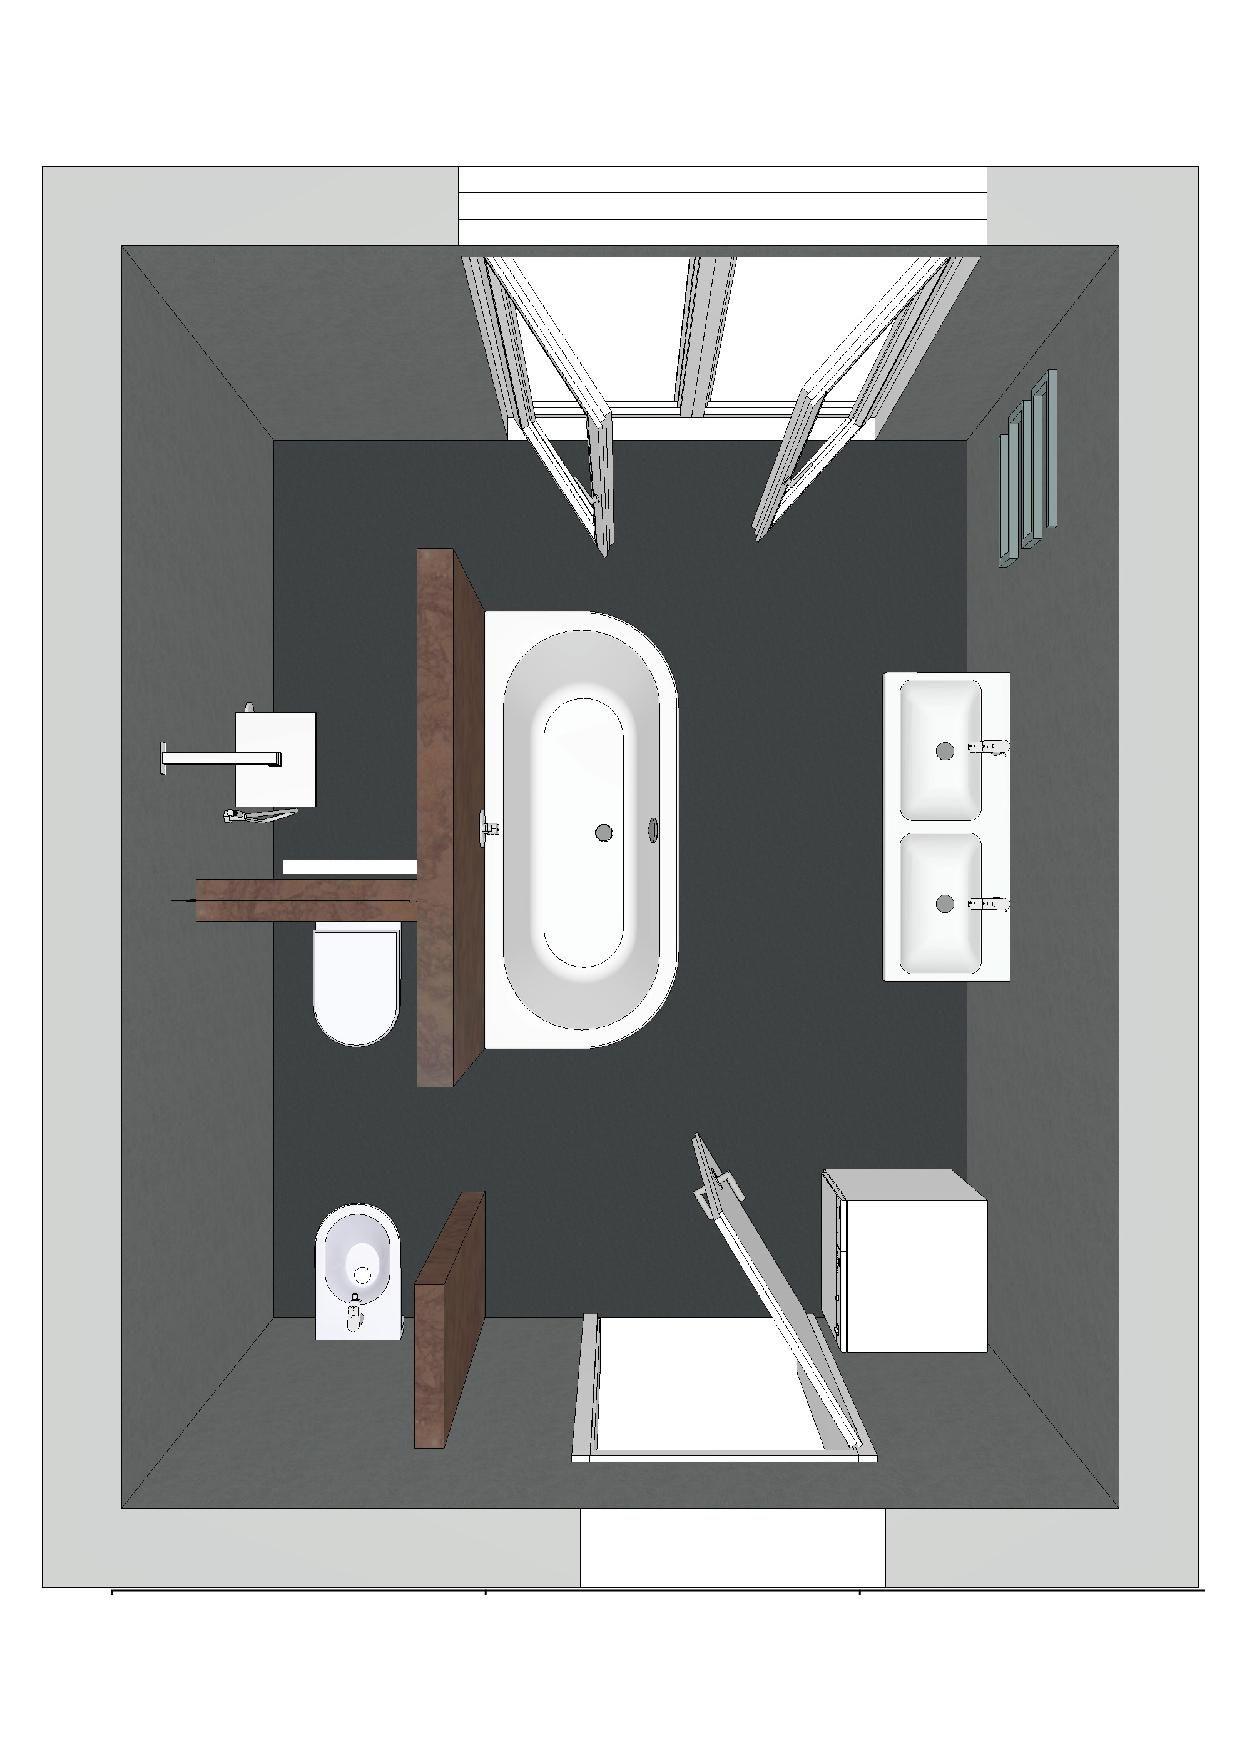 Badplanung Mit T Losungen Sind Trendy Und Beliebt Design Del Bagno Bagno Rimodellare Progettazione Bagno